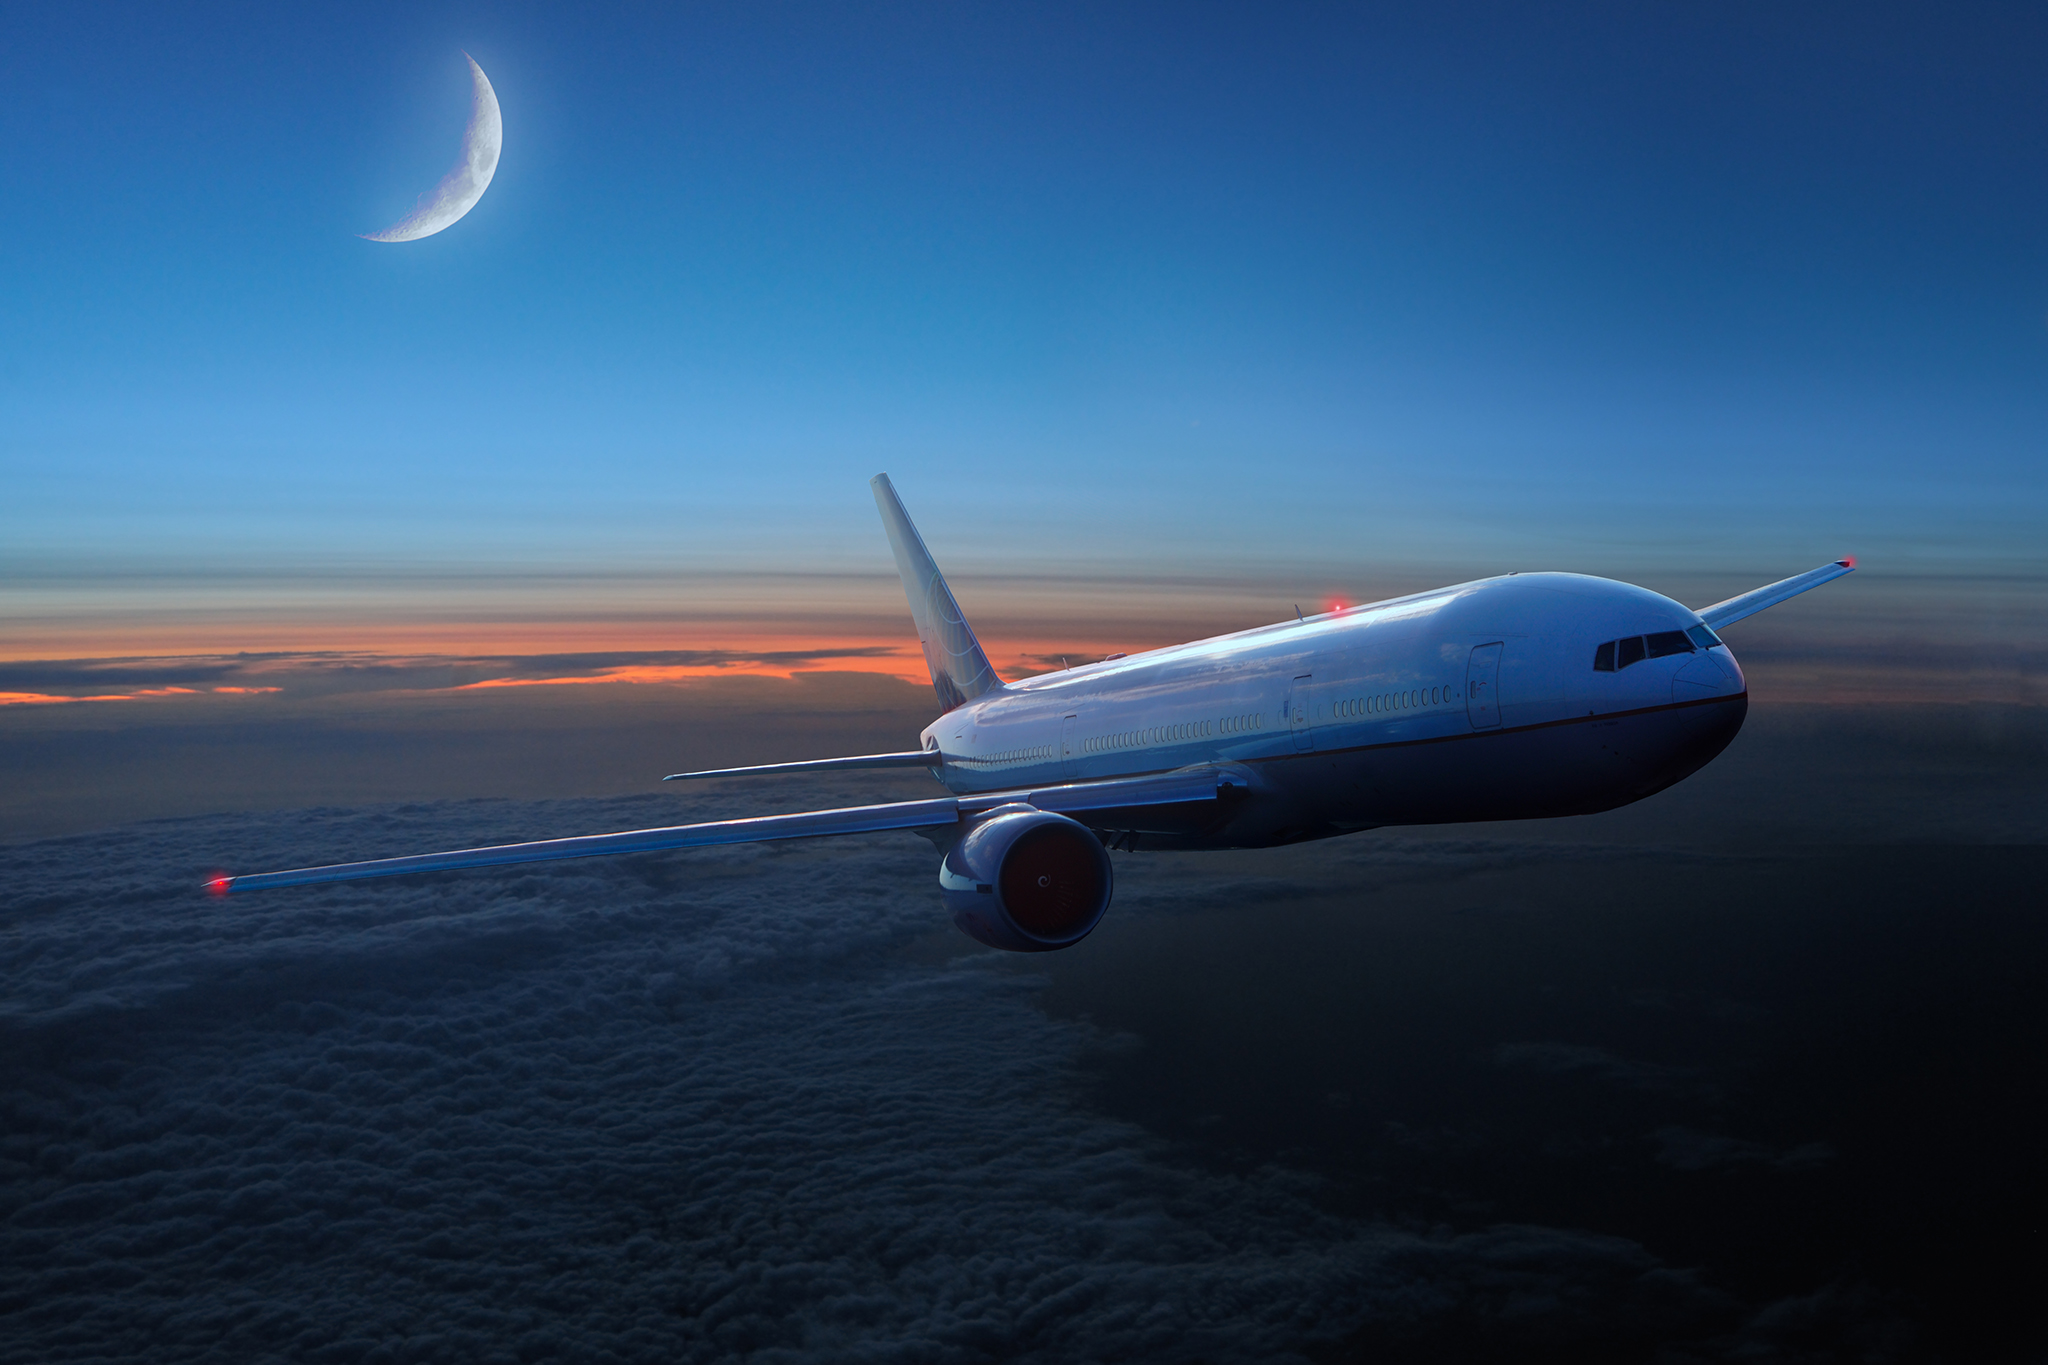 Картинки самолеты в небе